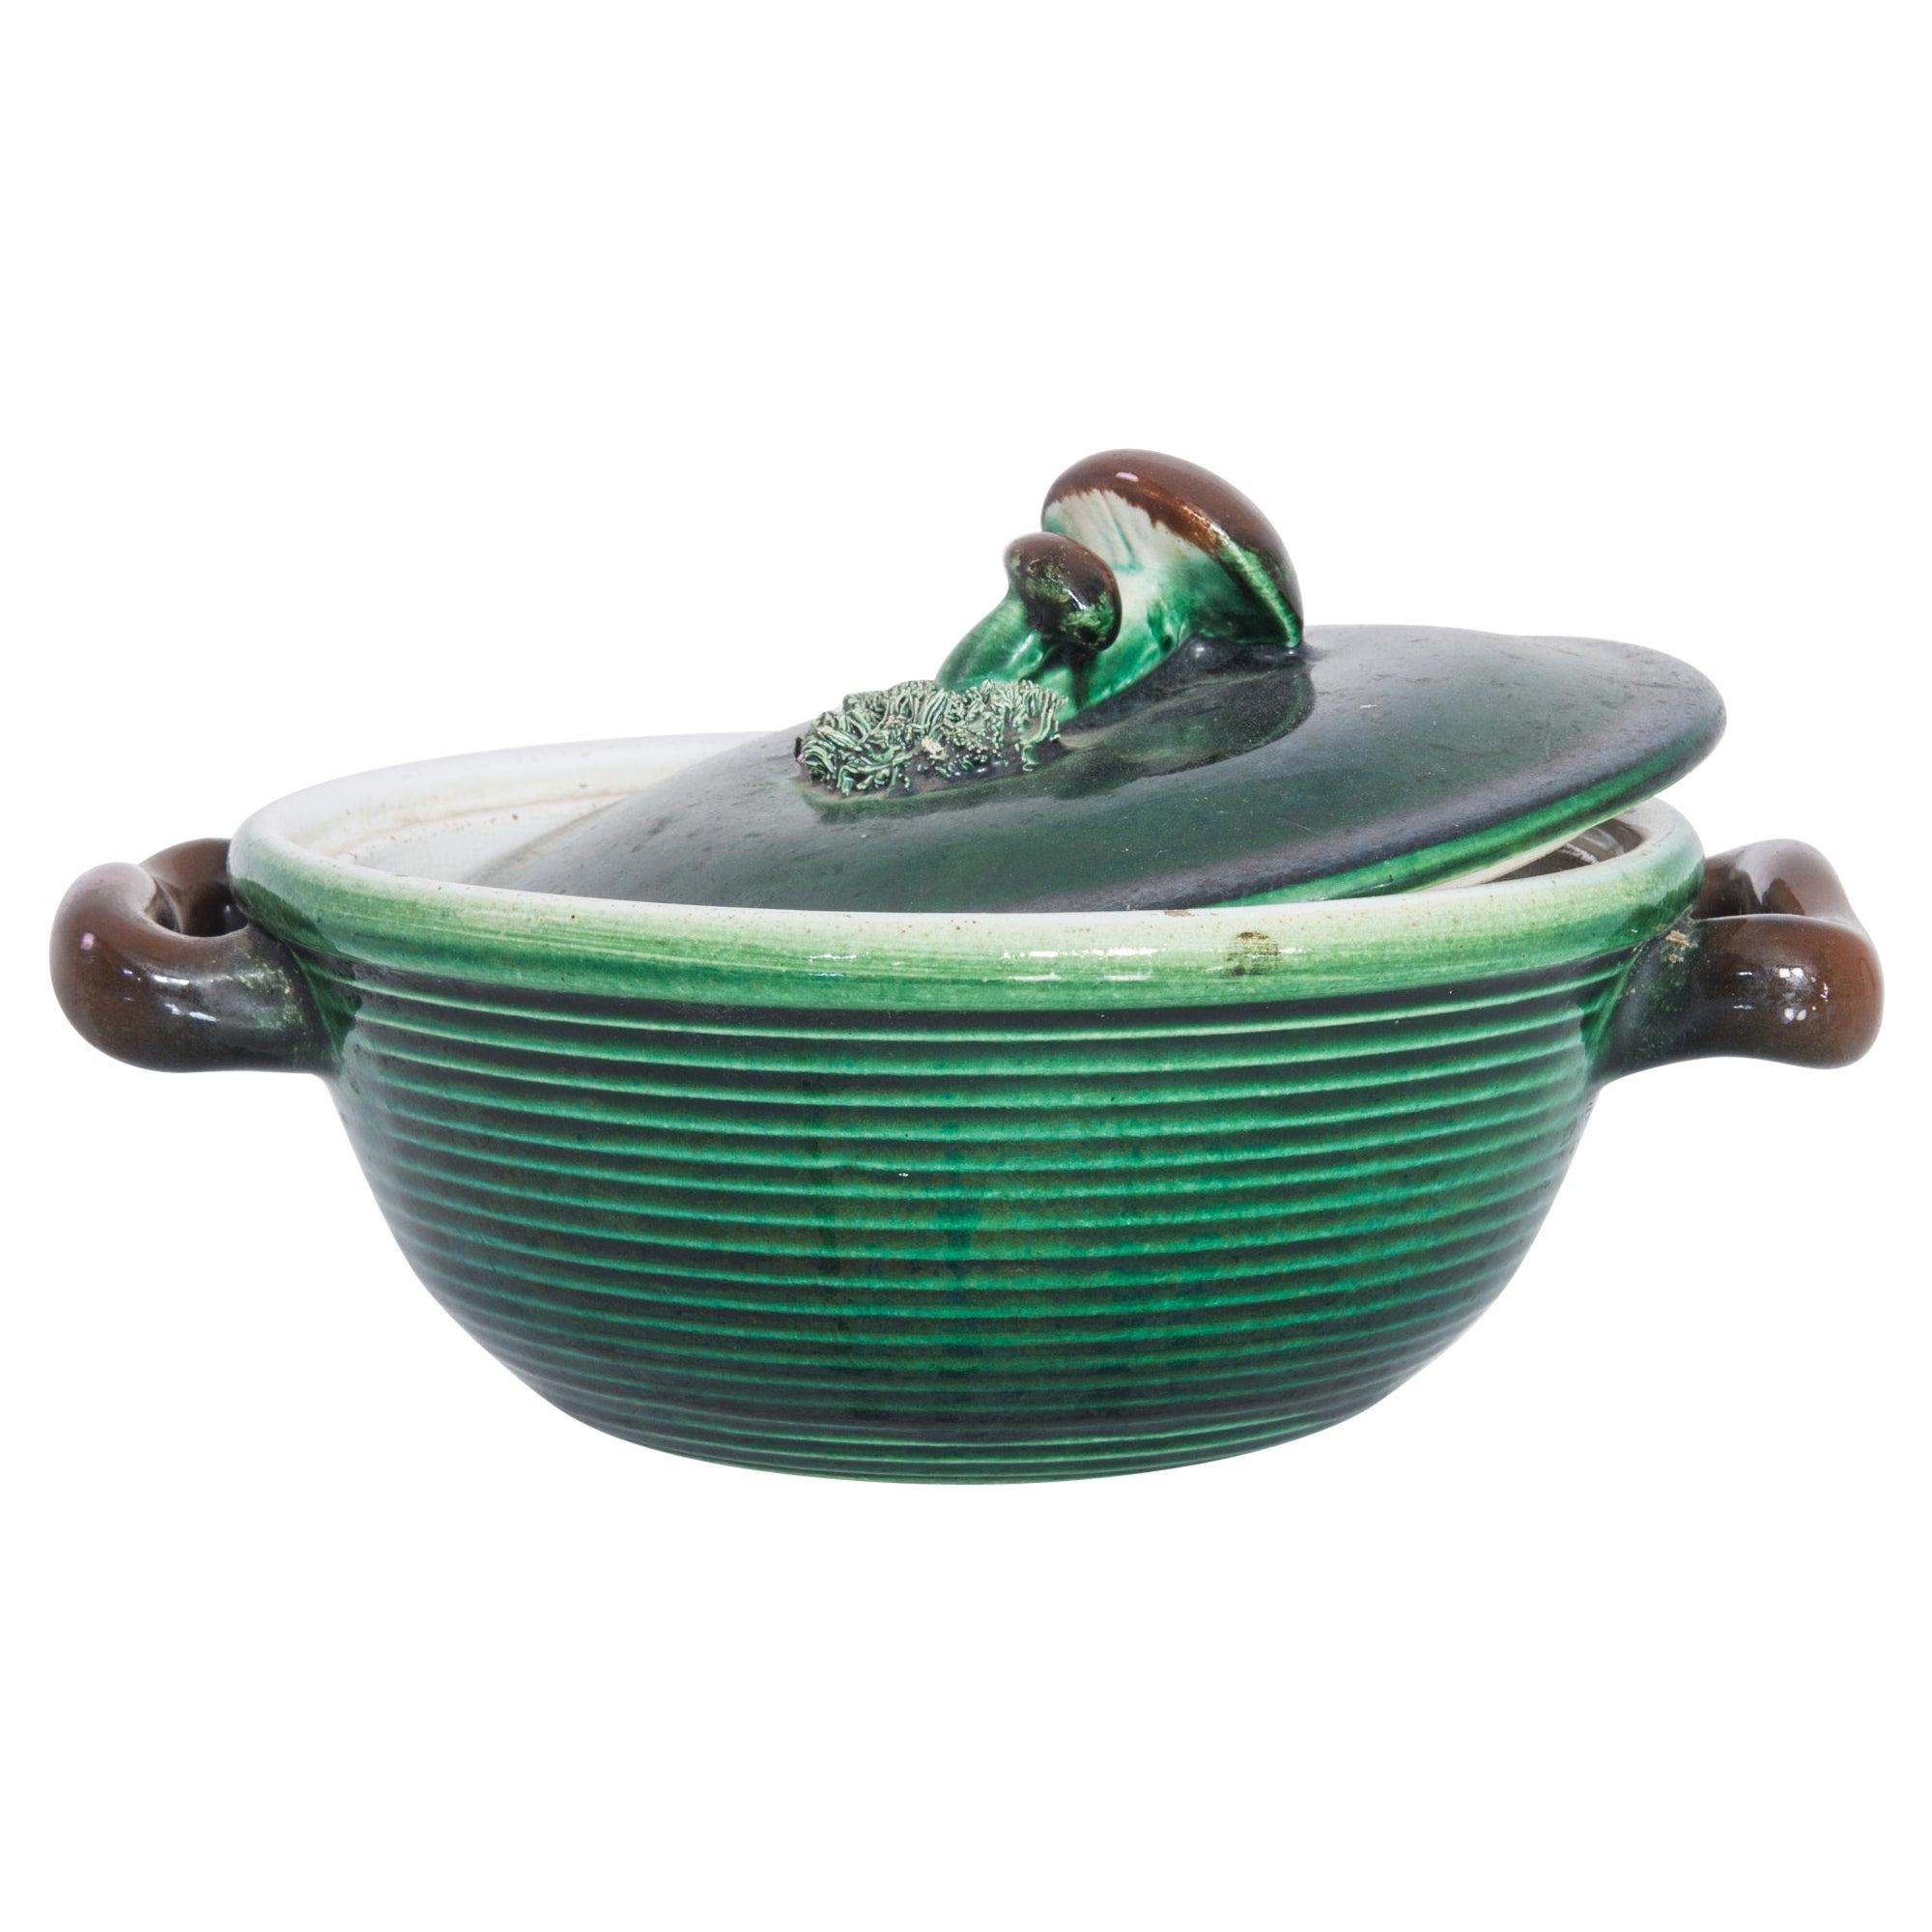 1930s Belgian Ceramic Bowl with Lid